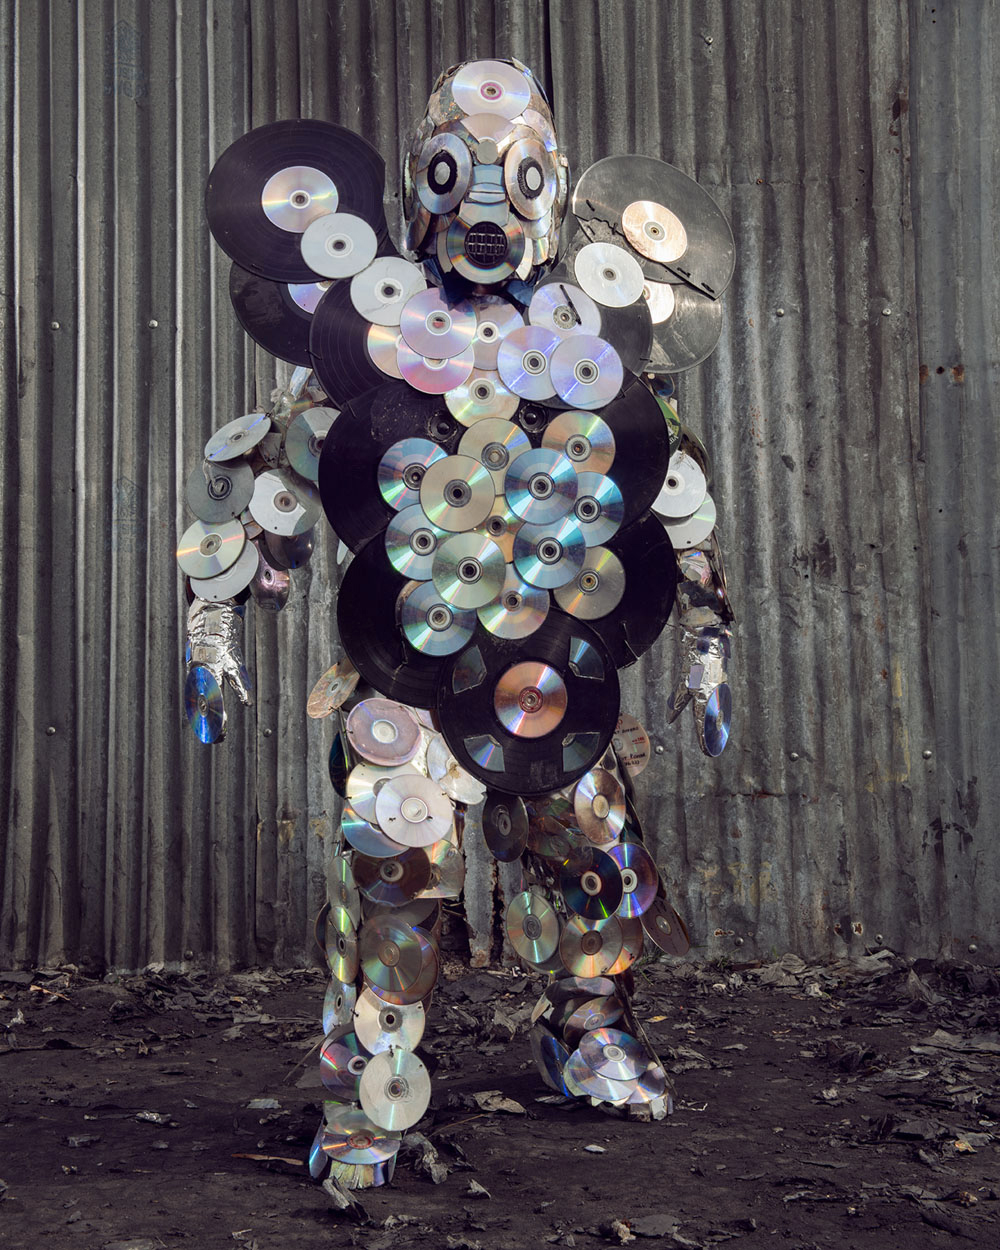 Untitled #18, 2020 Homo Detritus, Real Portraitik #5 Kinshasa, RDC ©Stephan Gladieu